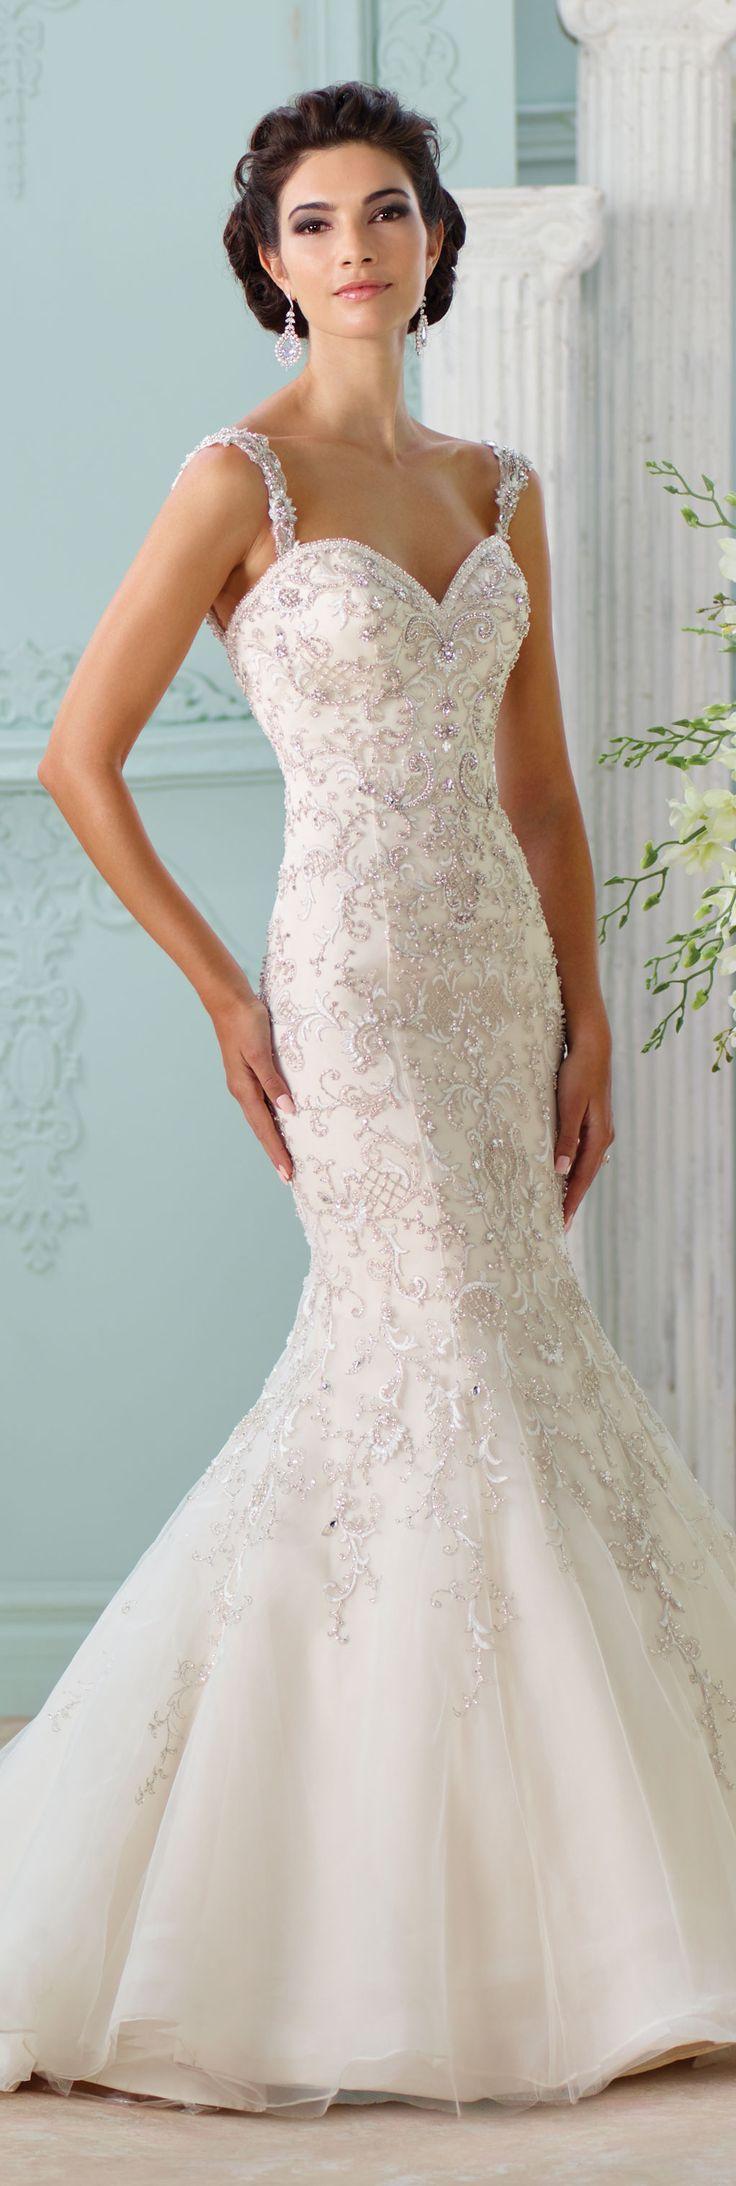 639 best For Jordyn\'s Country Wedding images on Pinterest ...